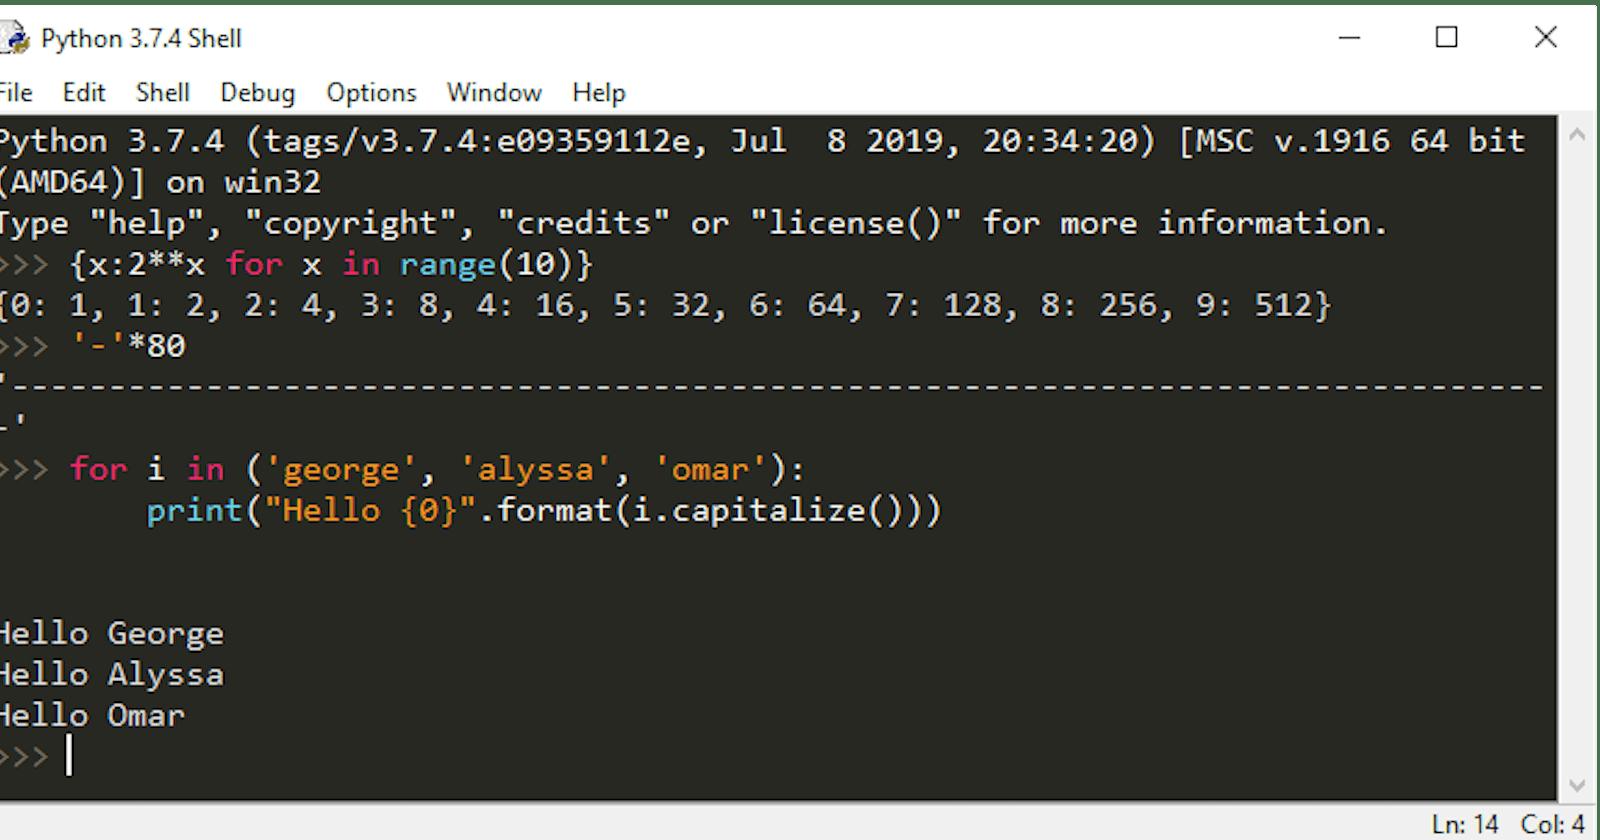 How to add Monokai dark highlighting theme to IDLE Python Shell